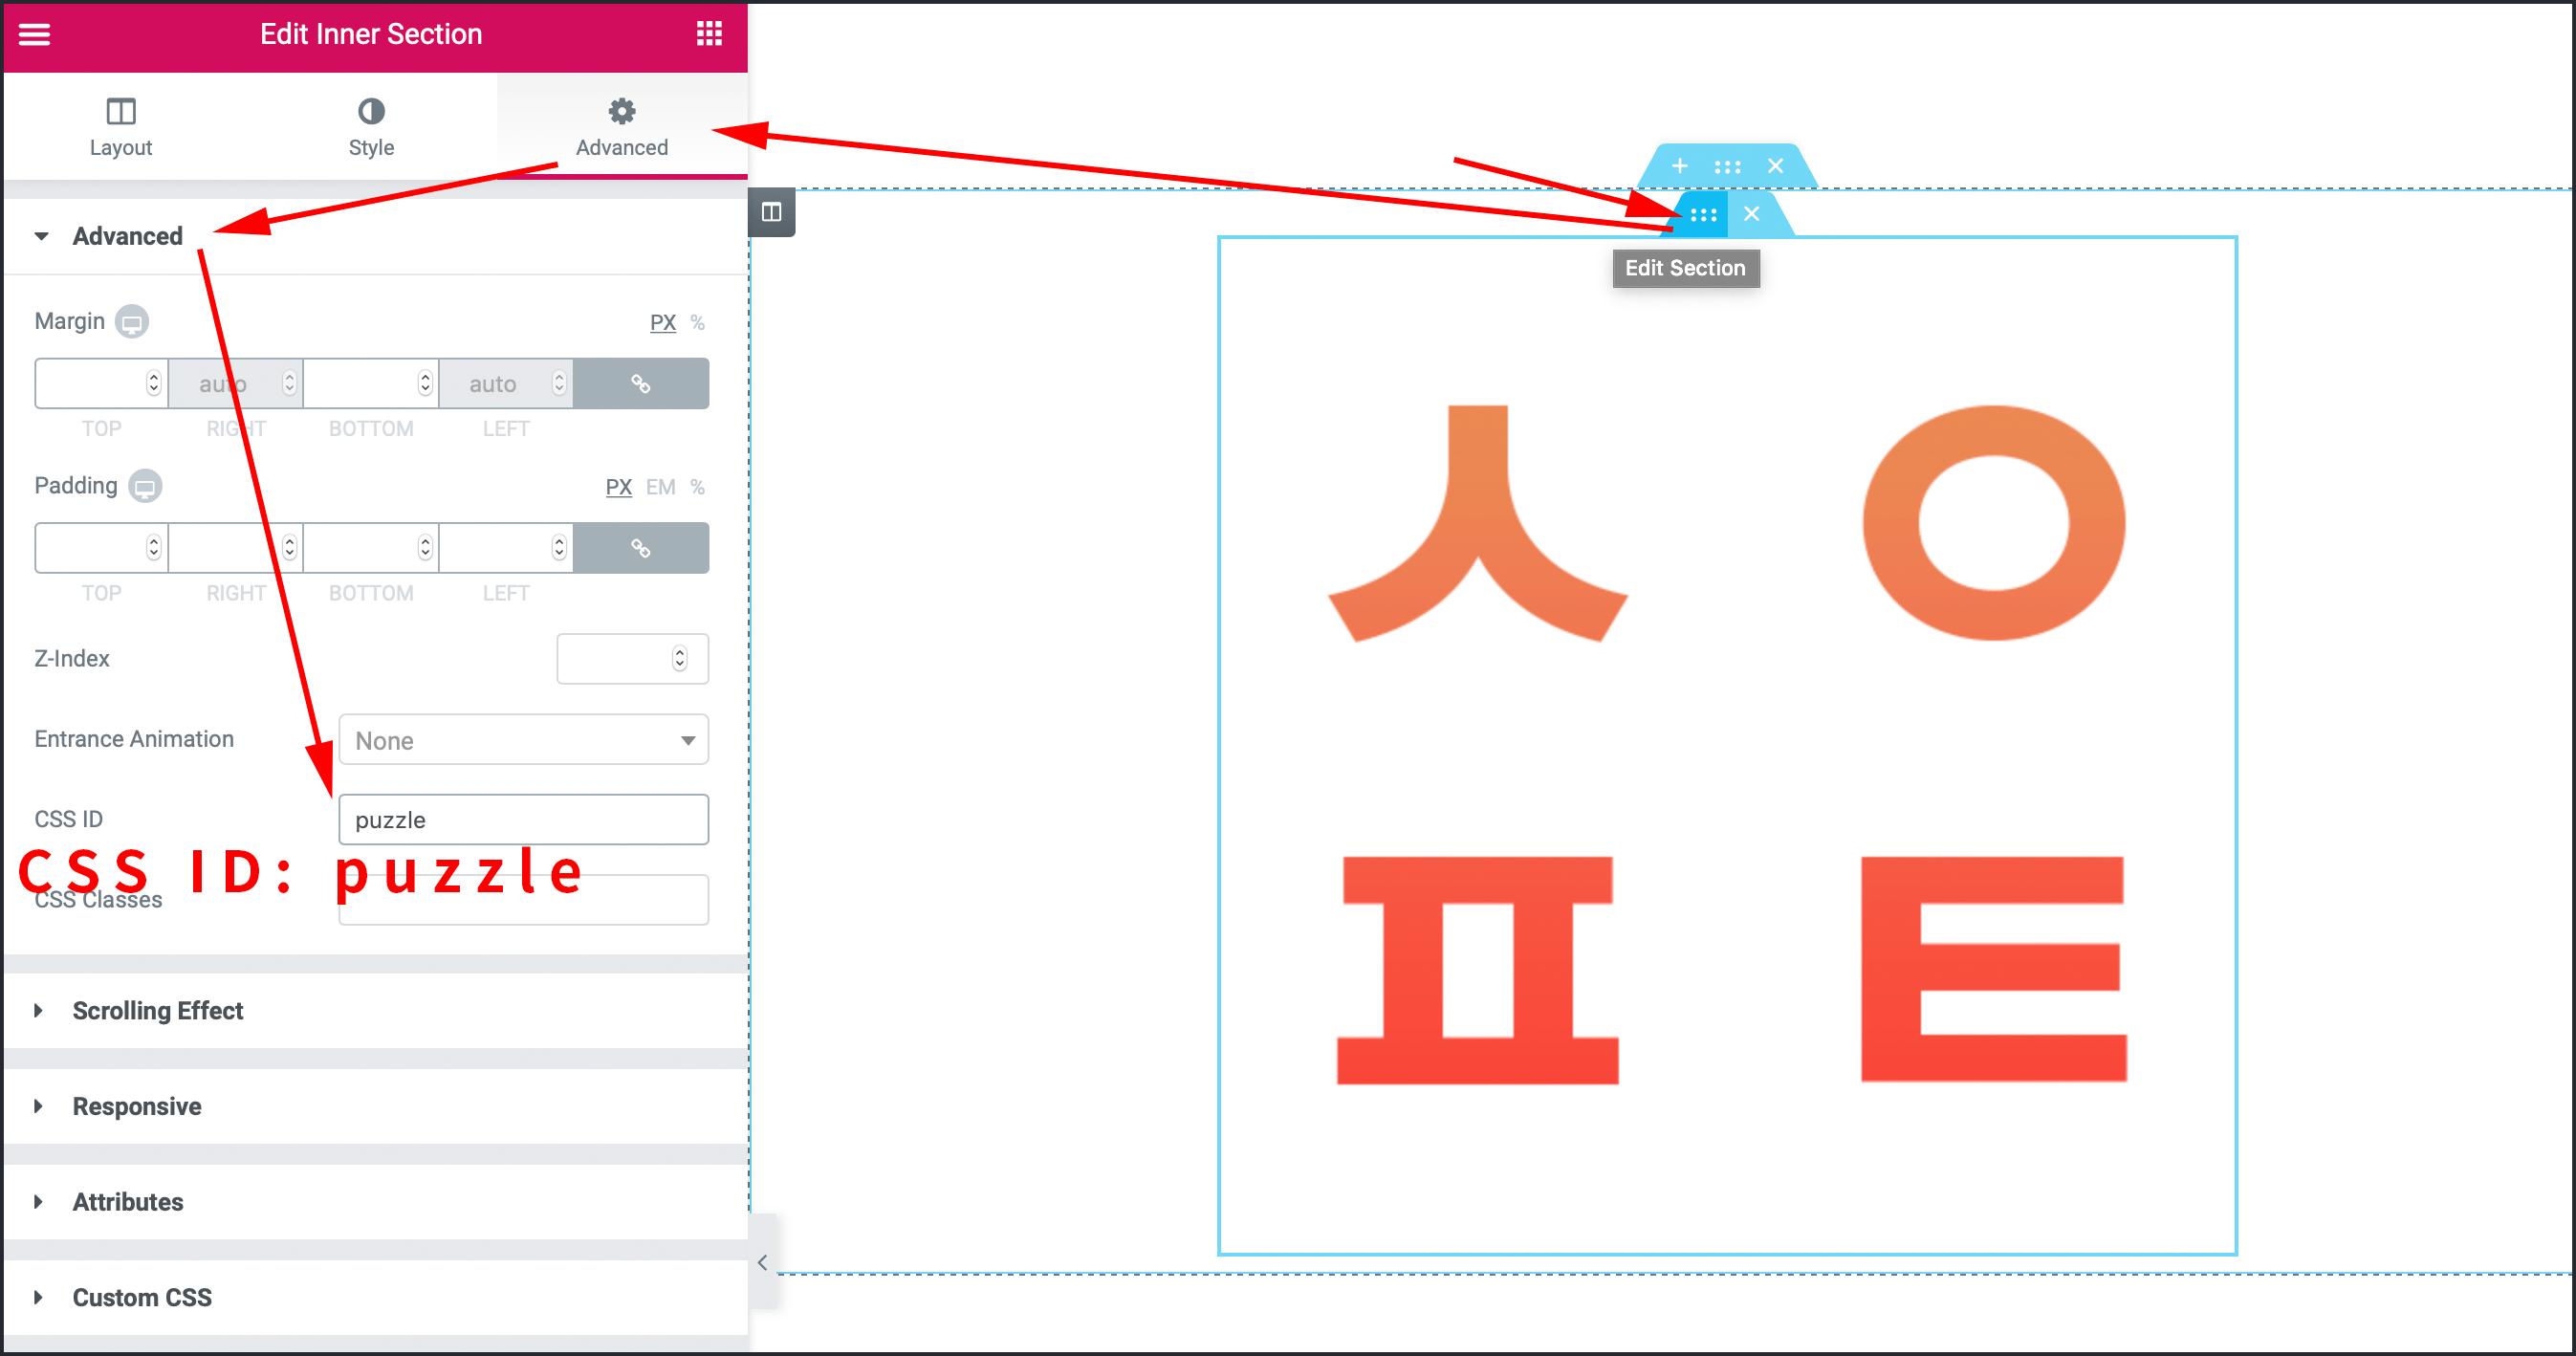 CSS ID 옵션에 puzzle 입력